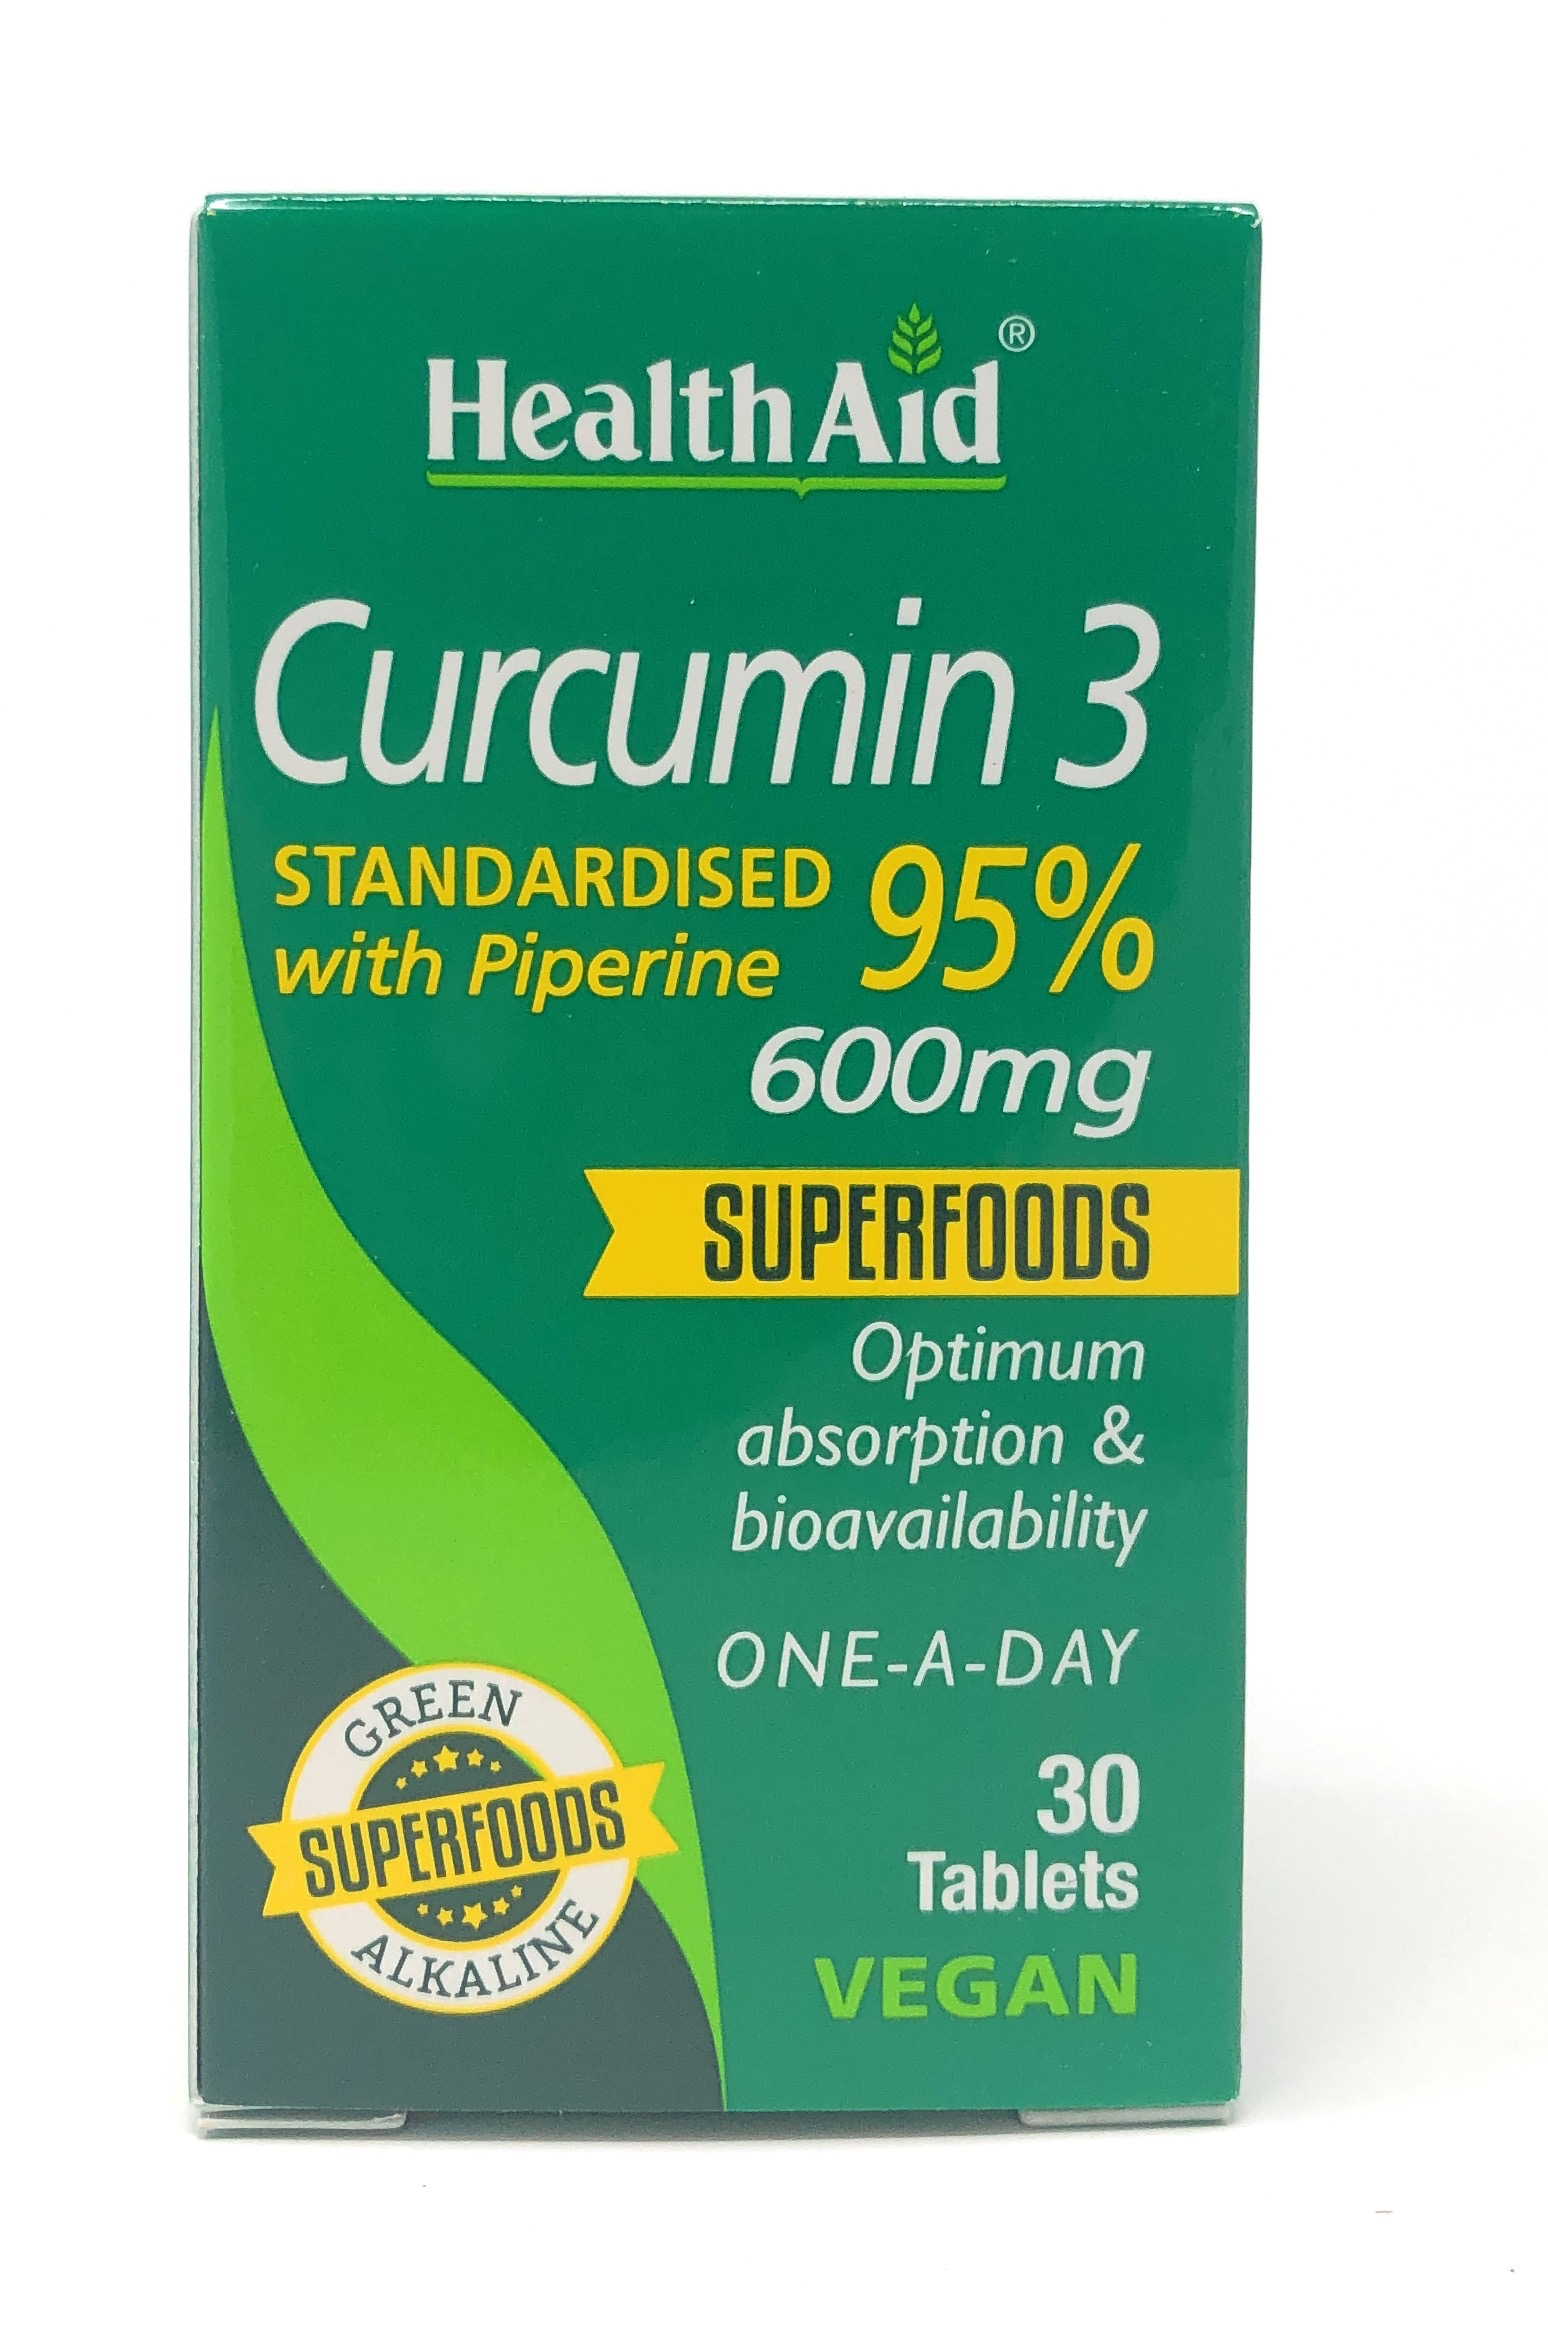 HealthAid Curcumin 3 600mg (Standardised 95% with Piperine) 30 Tabletten (vegan)